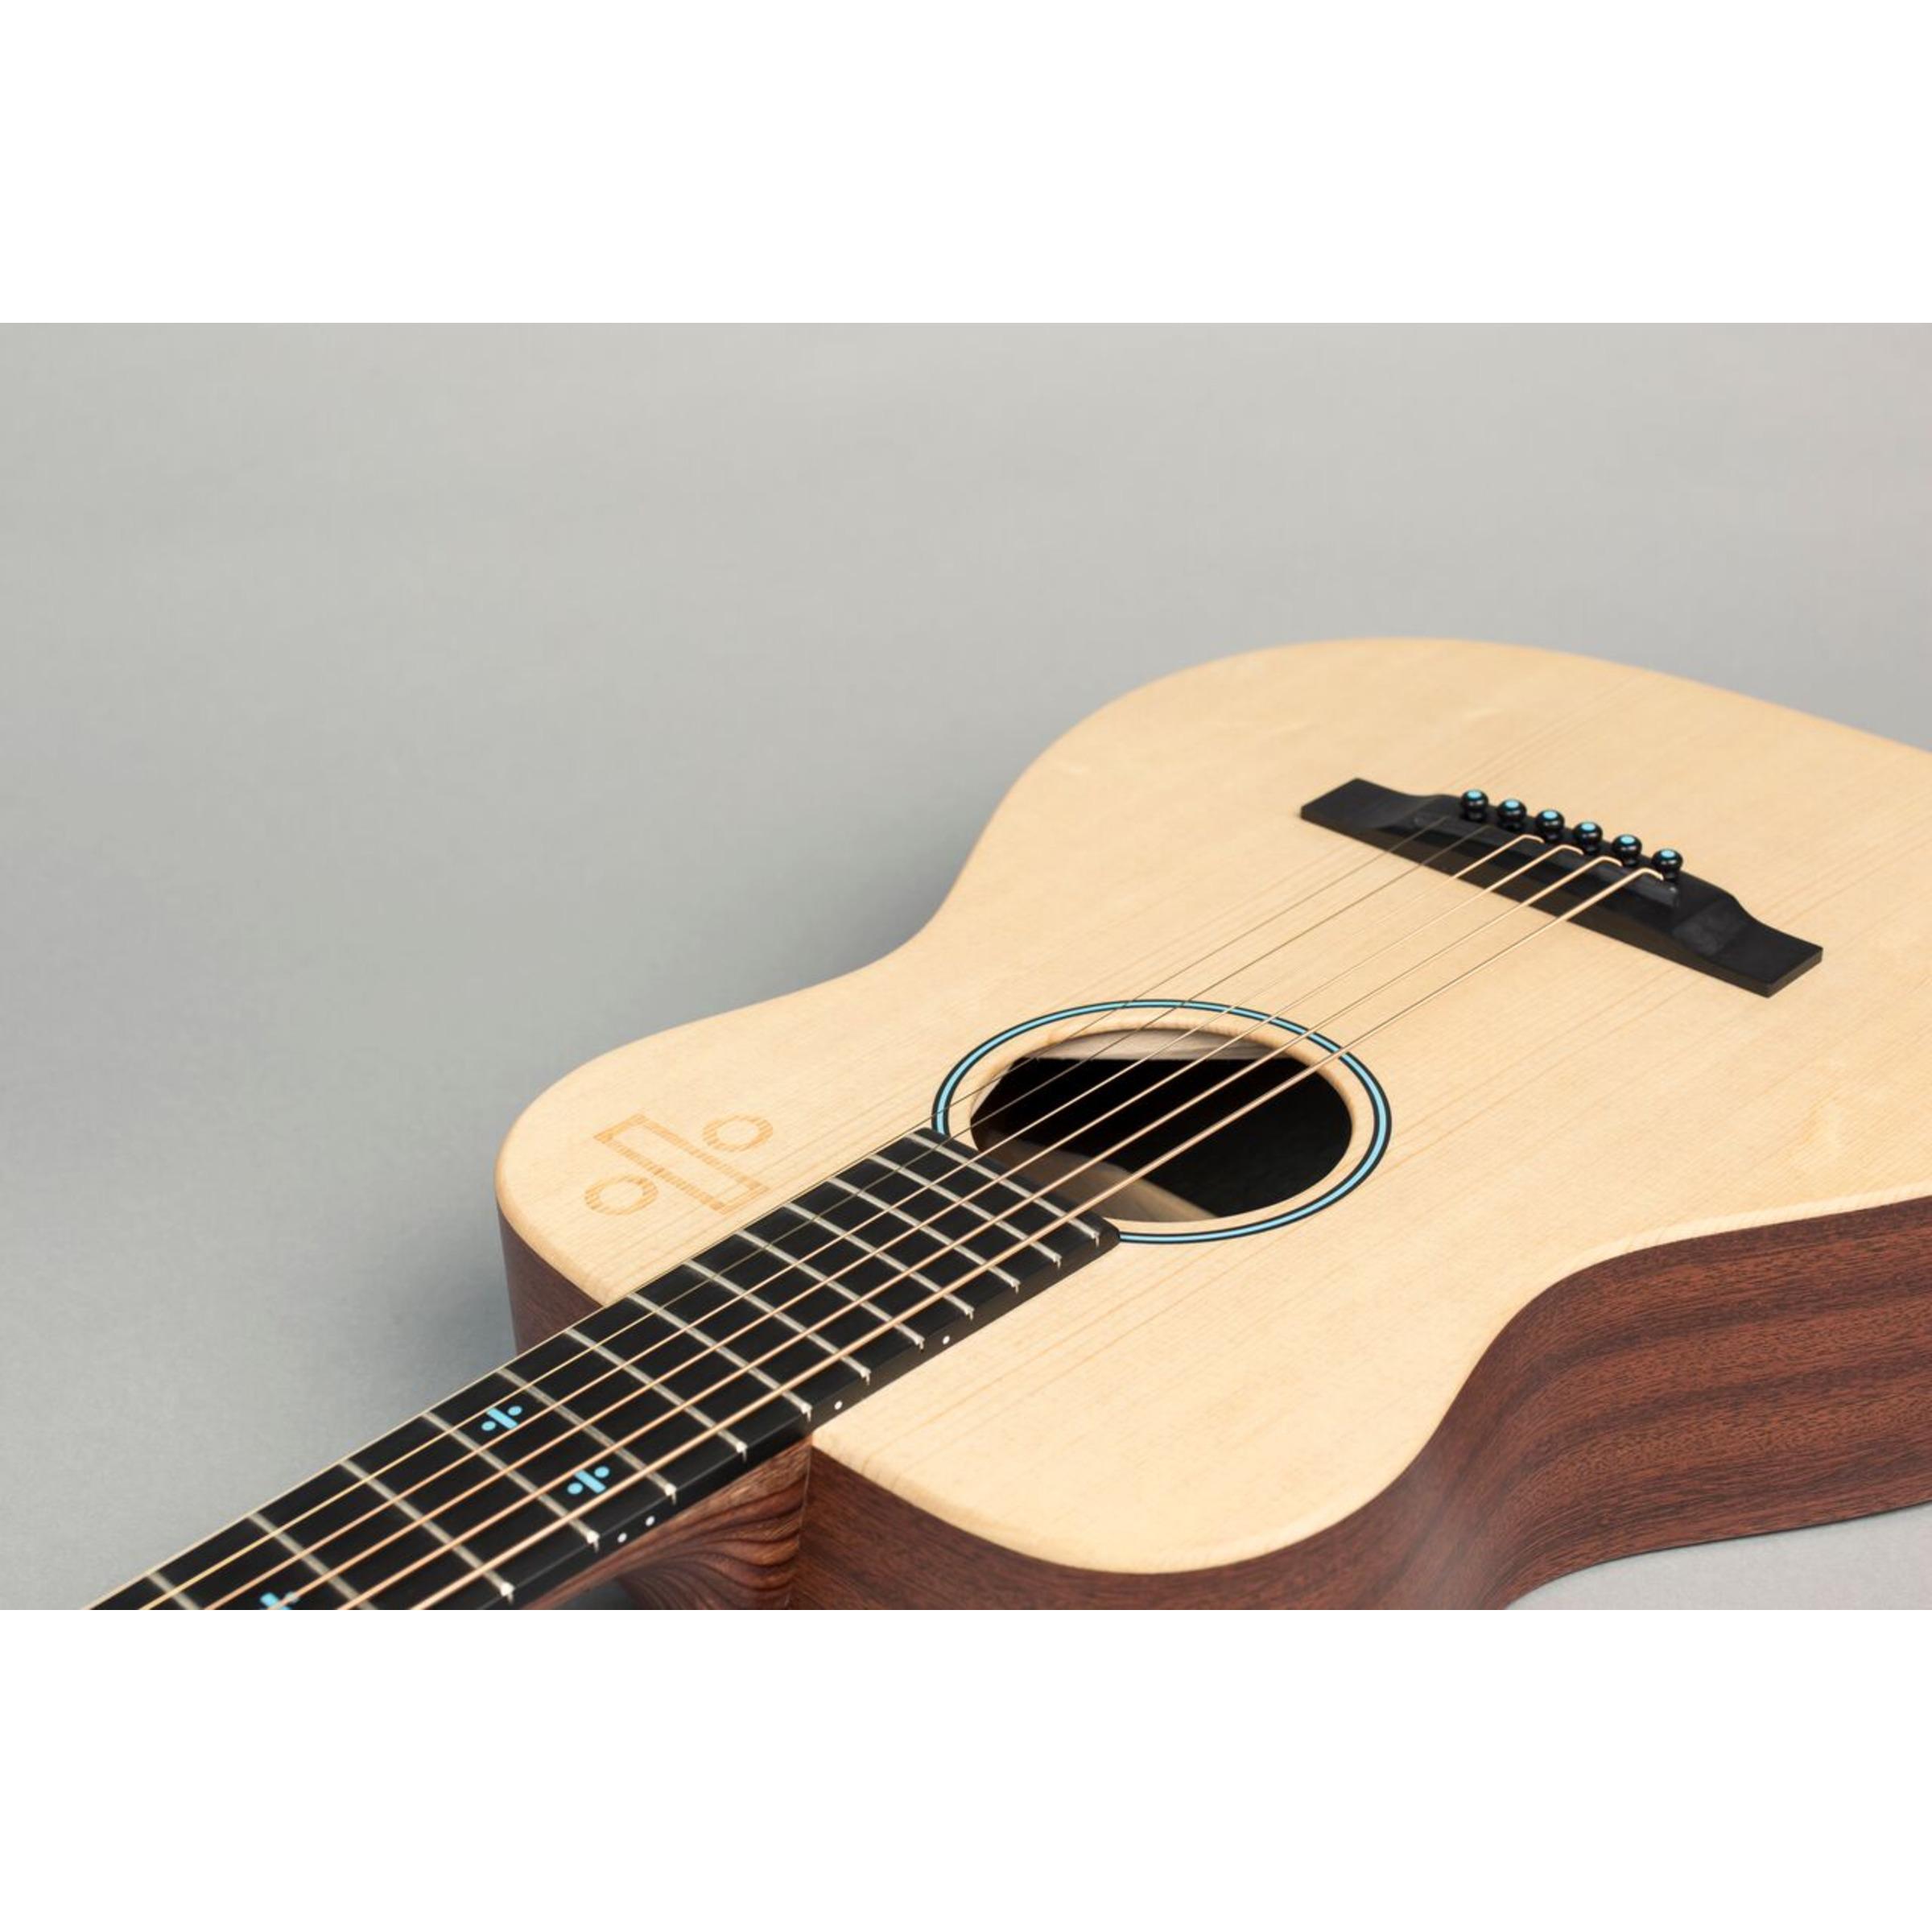 Ed Sheeran Signature Guitar : martin ed sheeran 39 divide 39 signature guitar giggear ~ Russianpoet.info Haus und Dekorationen